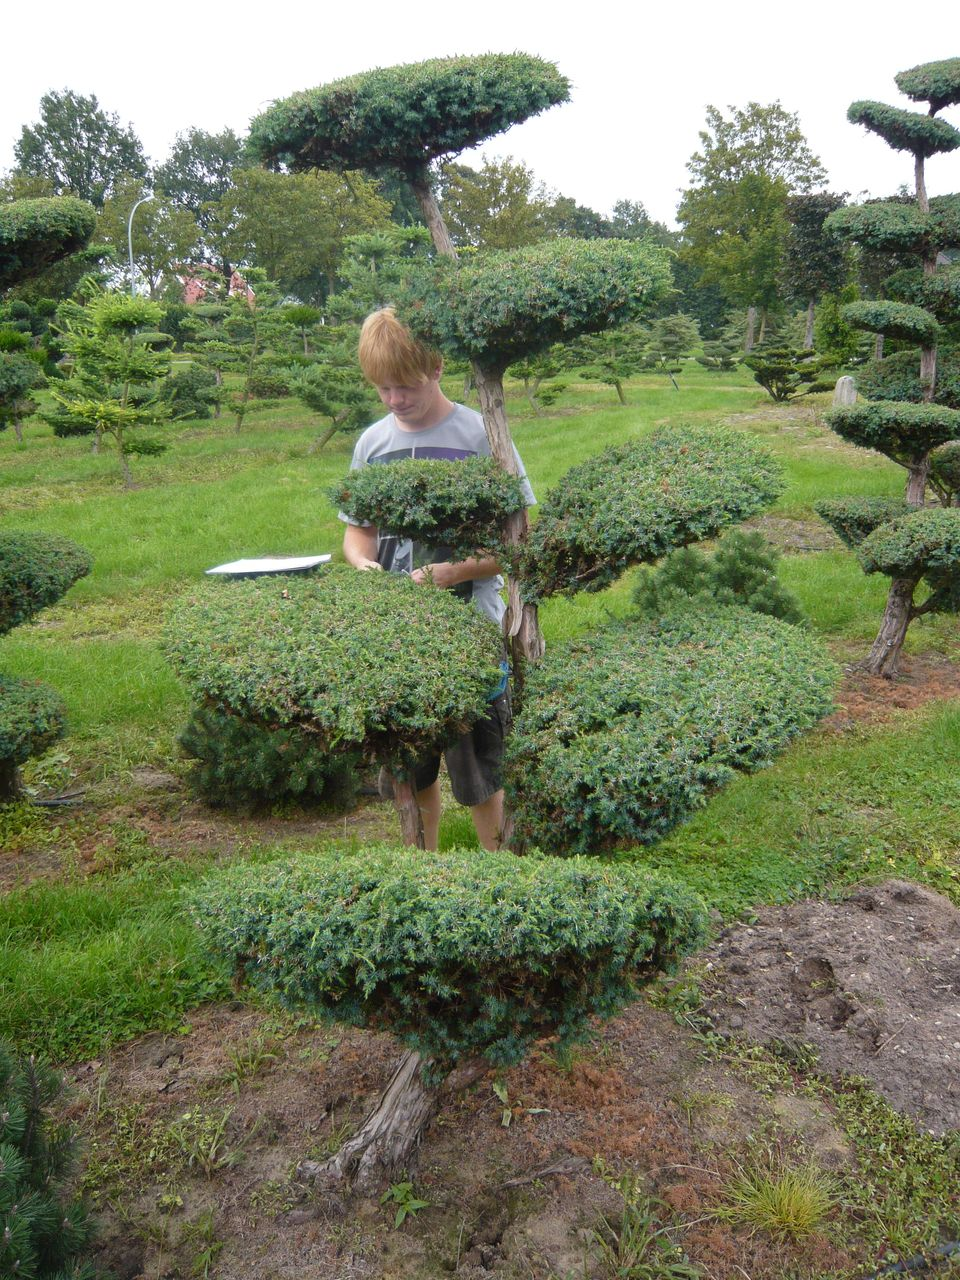 Pflanzenspecial gartenbonsai kostbarkeiten japans - Winterharte pflanzen fur den garten ...